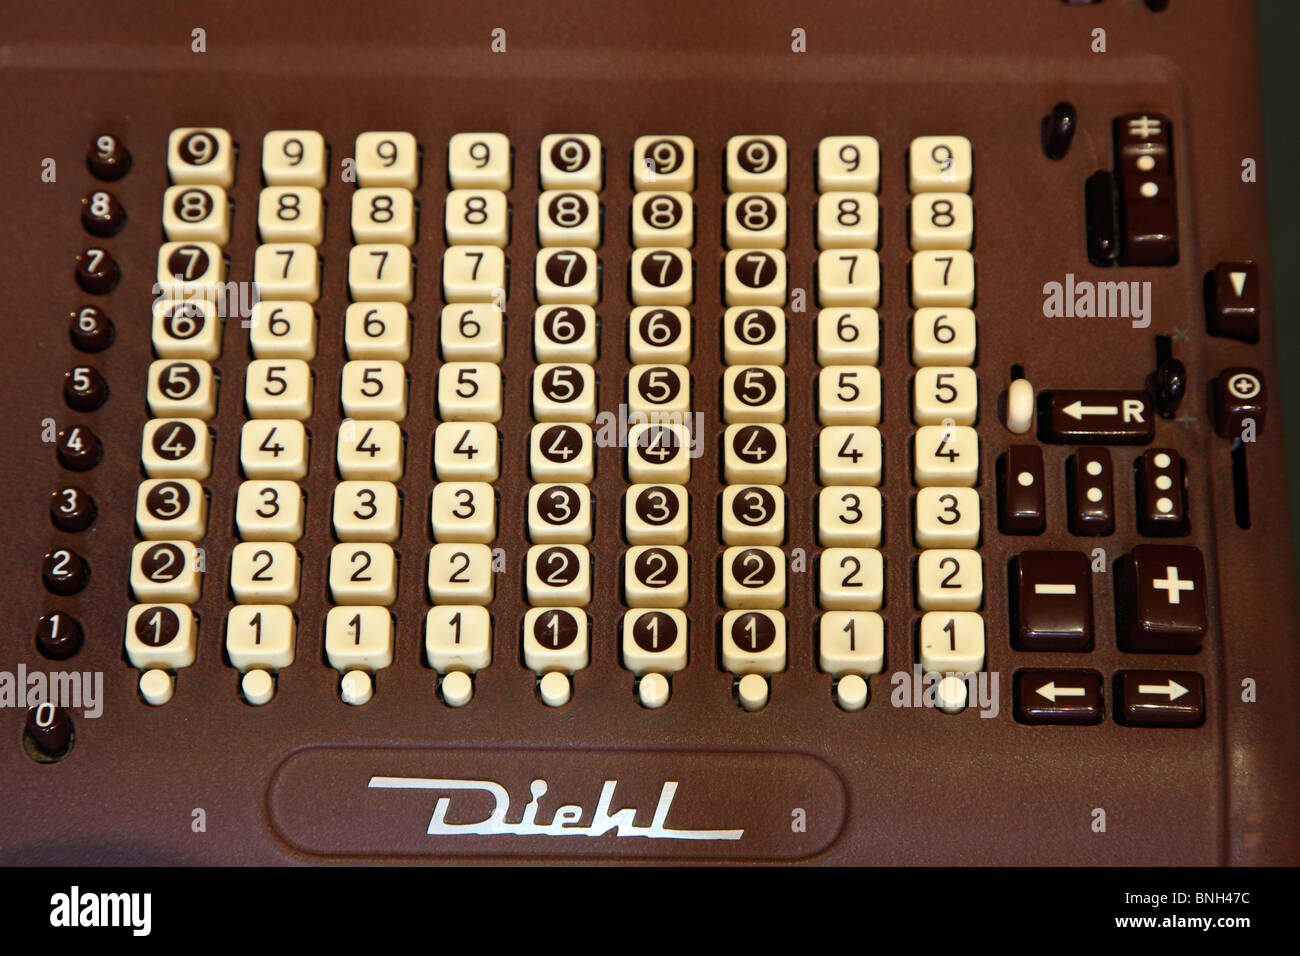 10 Key Calculator Pc Keys – Wonderful Image Gallery